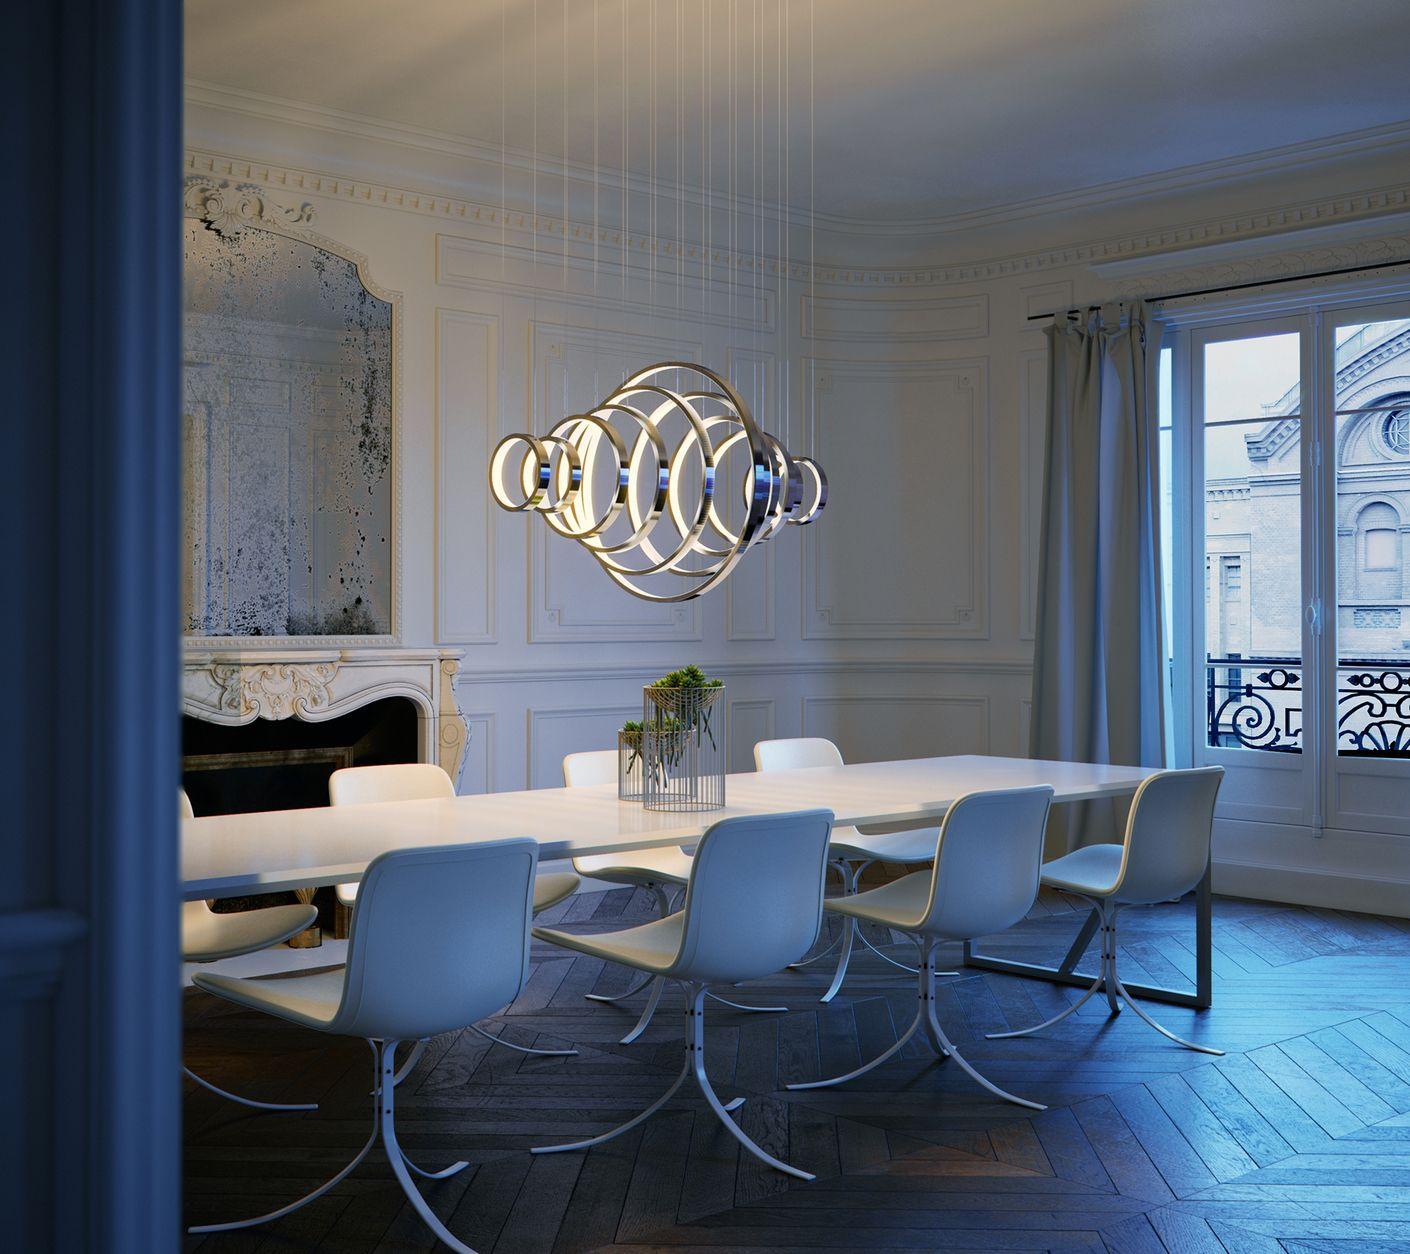 Maxim dining albert mizuno chaos group interior lighting modern lighting lighting design